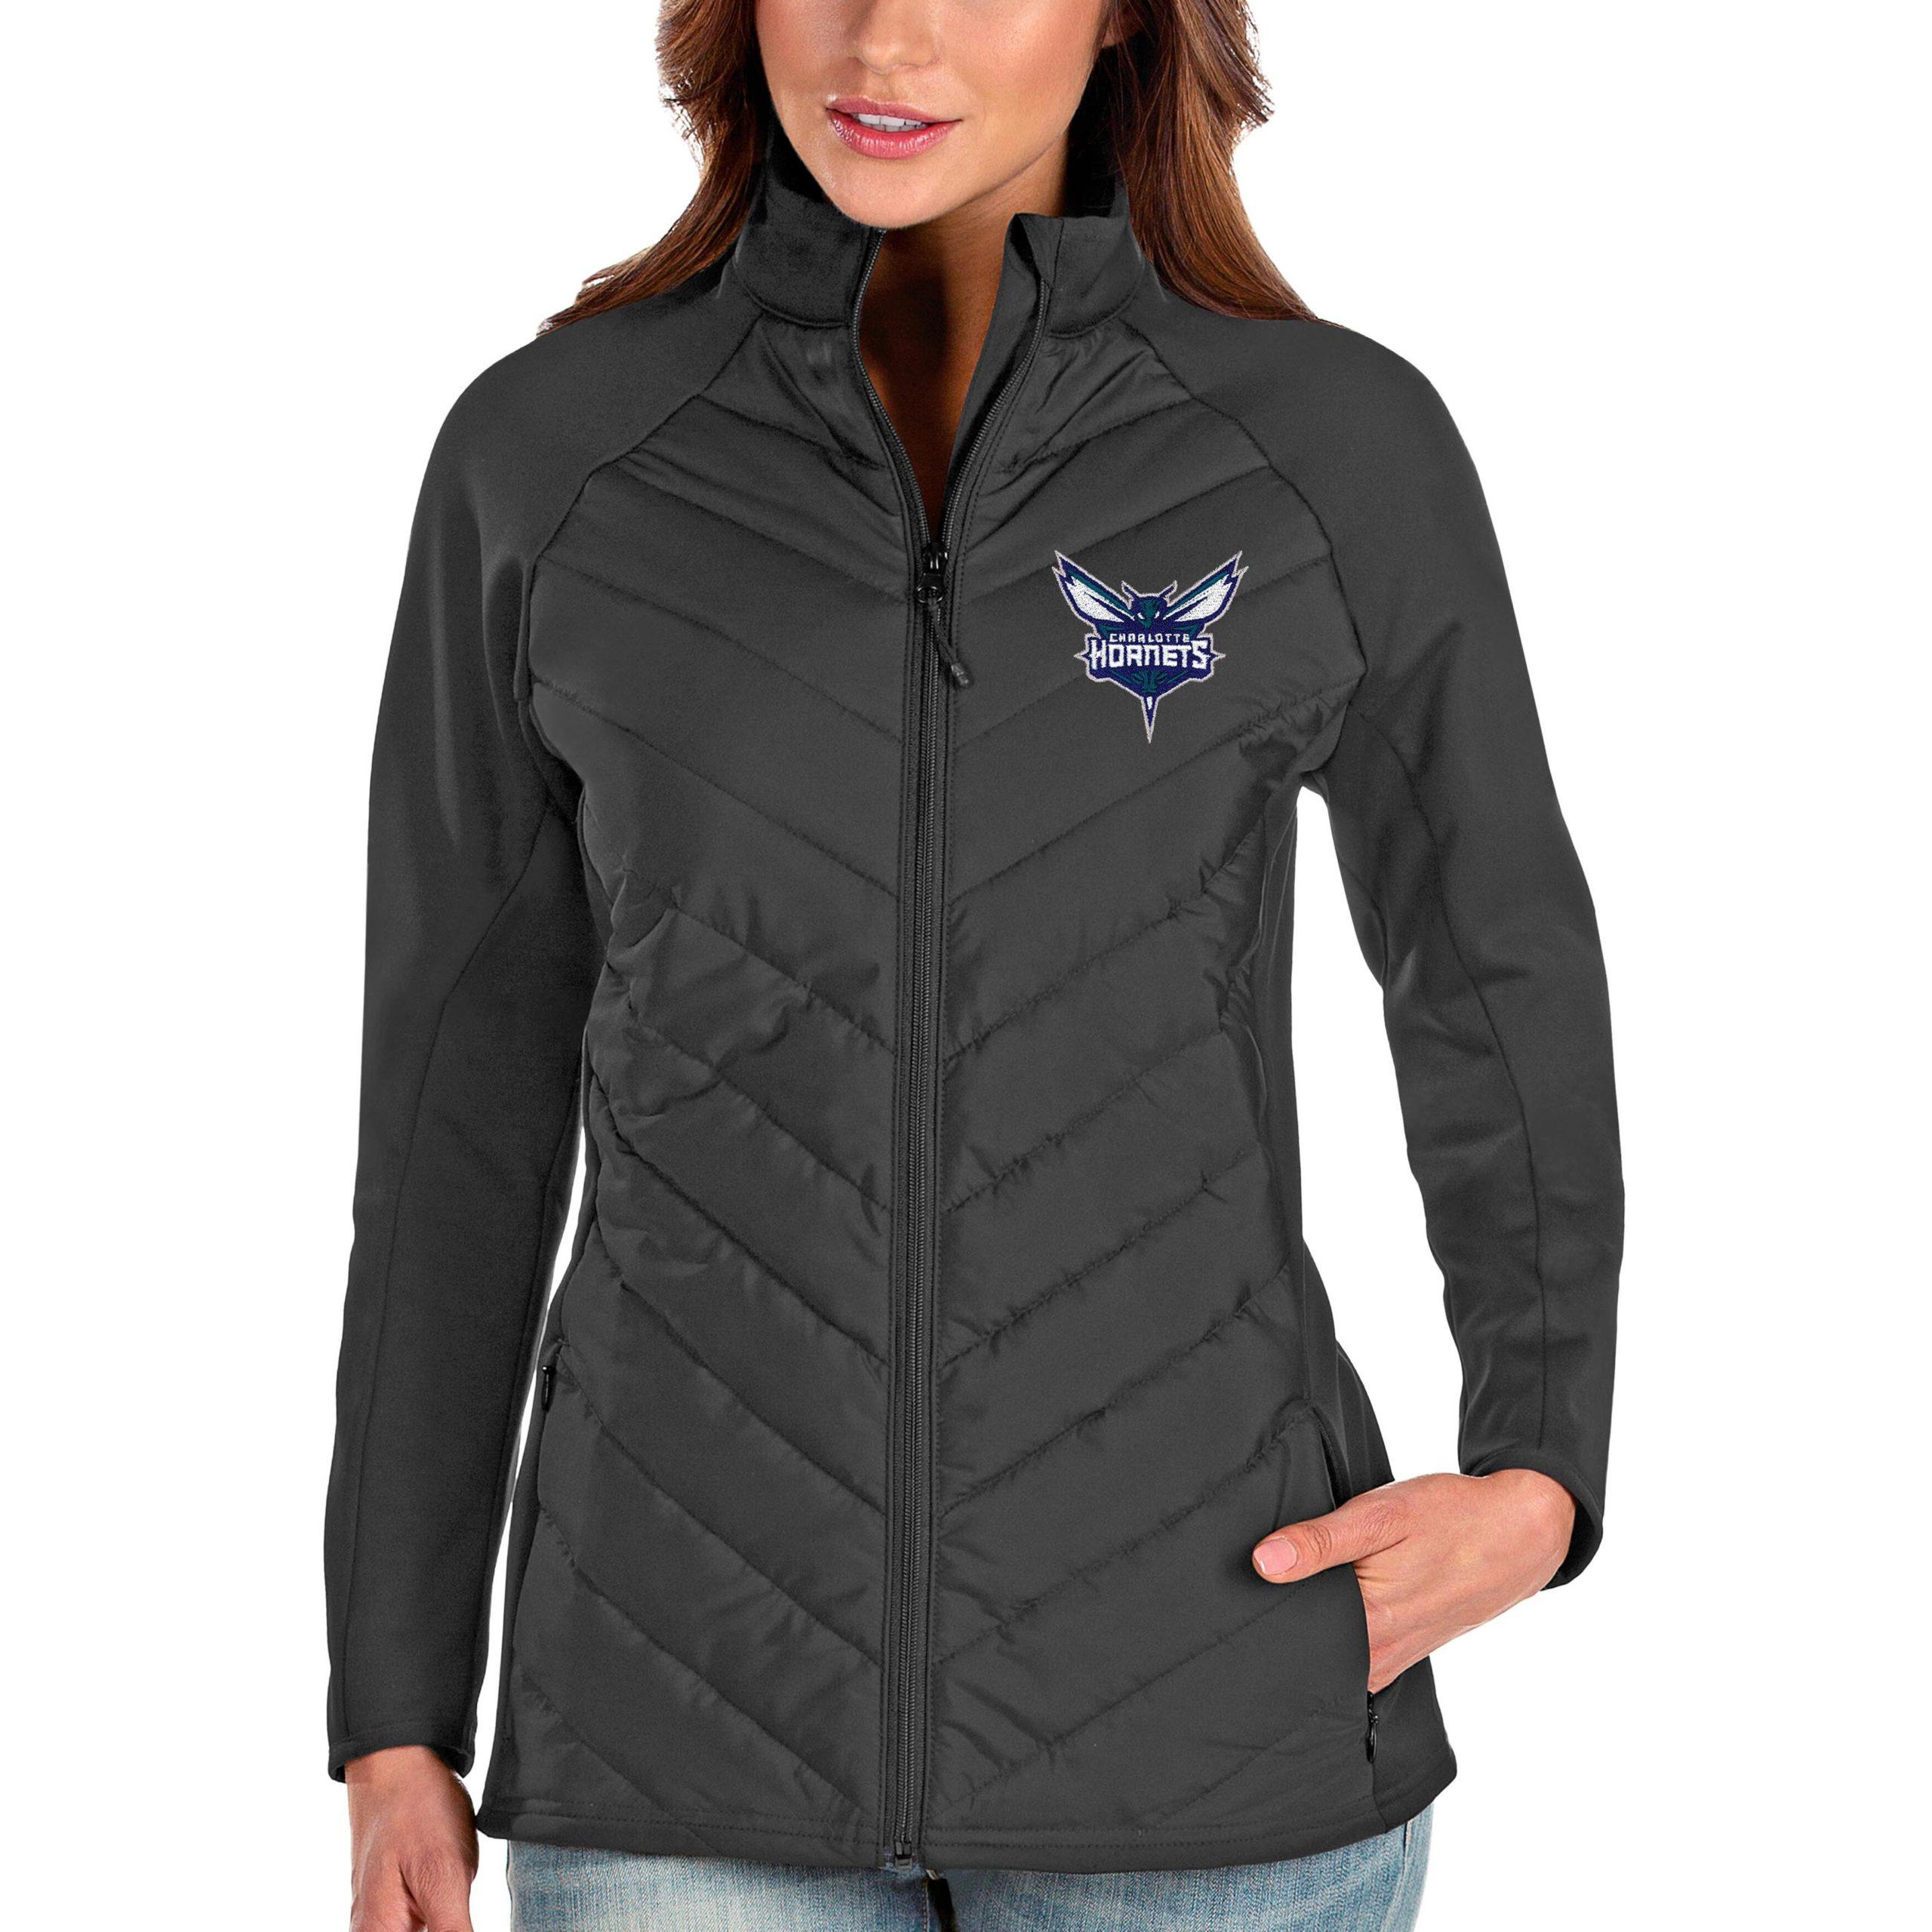 Charlotte Hornets Antigua Women's Altitude Full-Zip Jacket - Charcoal